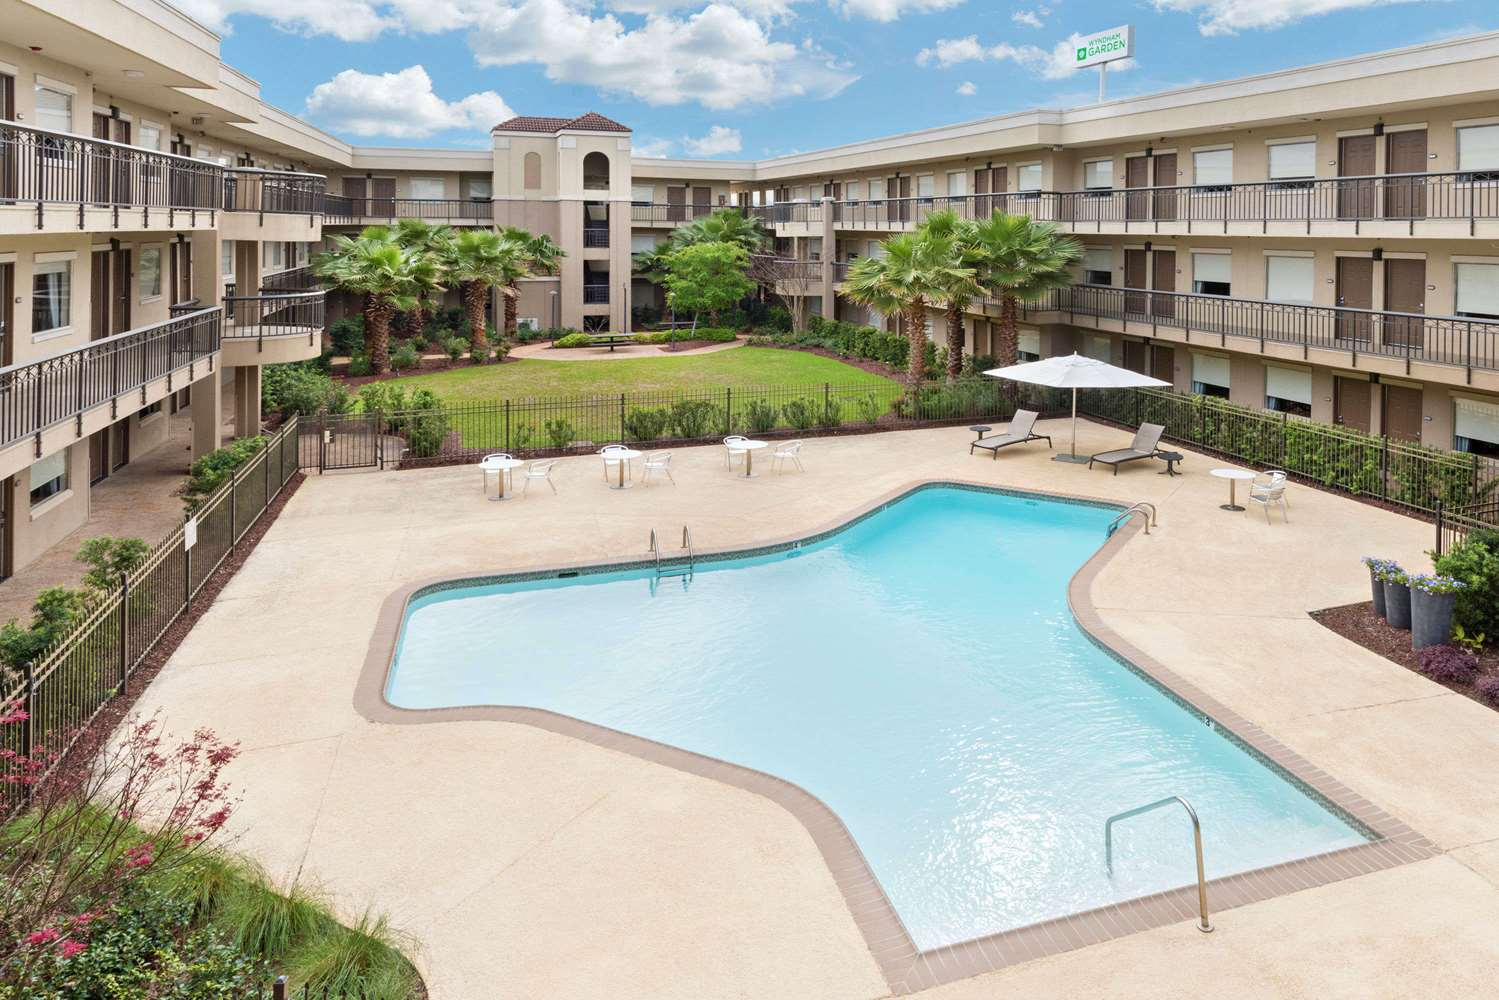 Pool - Wyndham Garden Hotel Baton Rouge